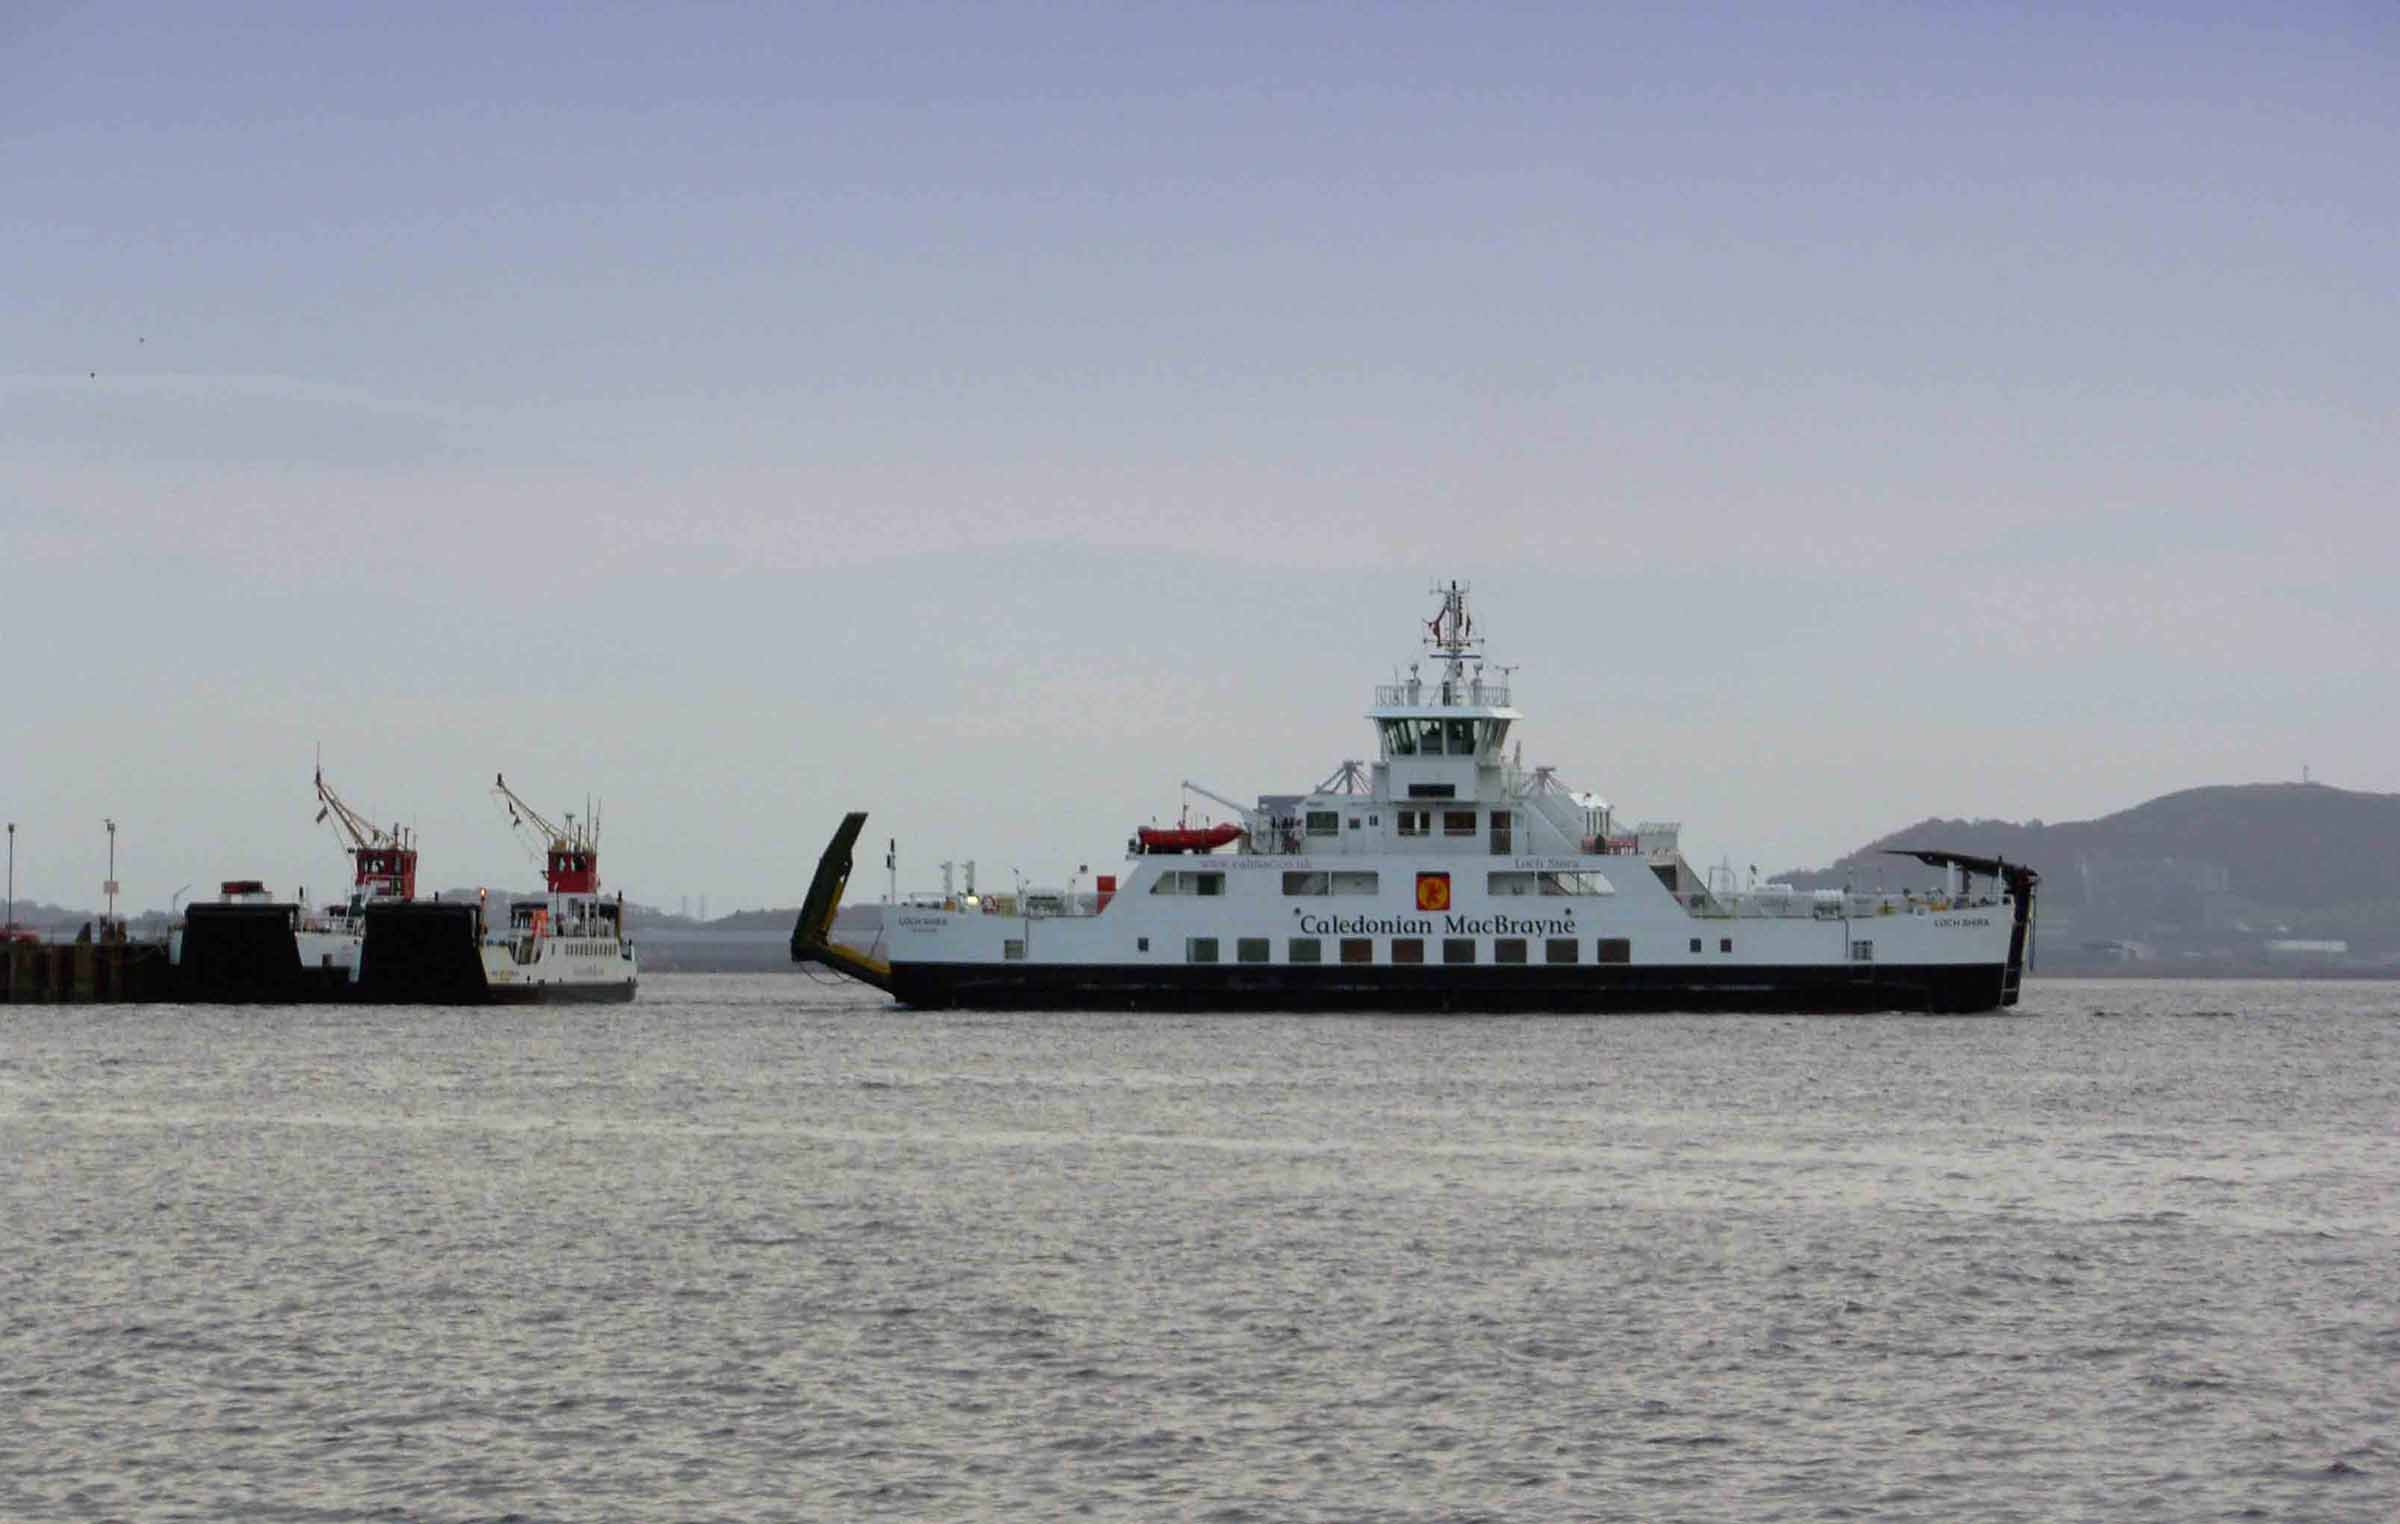 3 Generations of Cumbrae Ferry